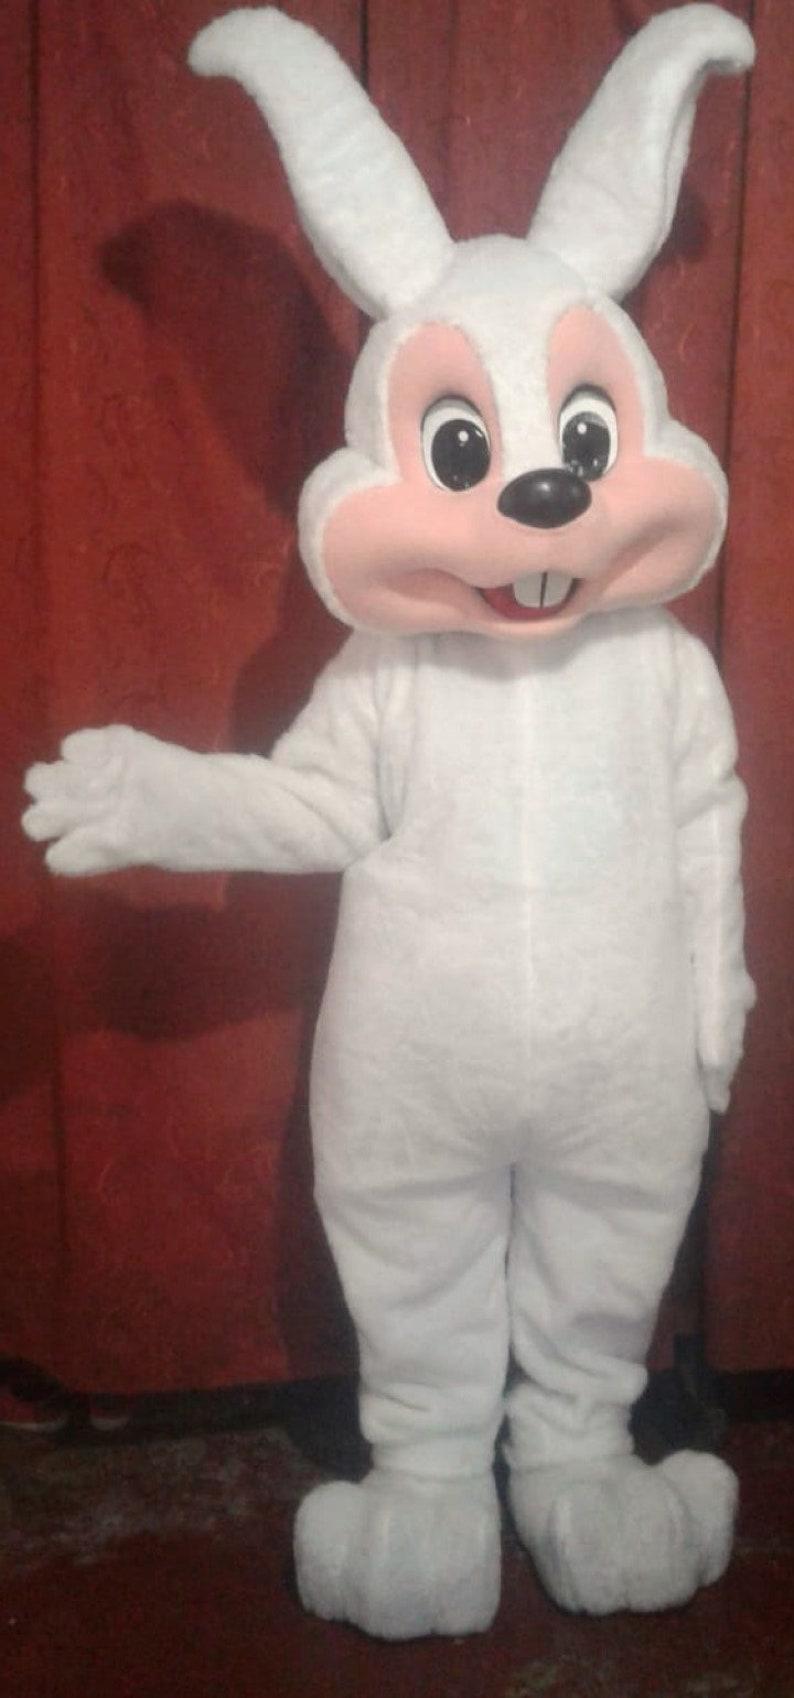 mascotte costume adulto  Easter Bunny mascotte Costume adulto Bunny Costume in vendita | Etsy